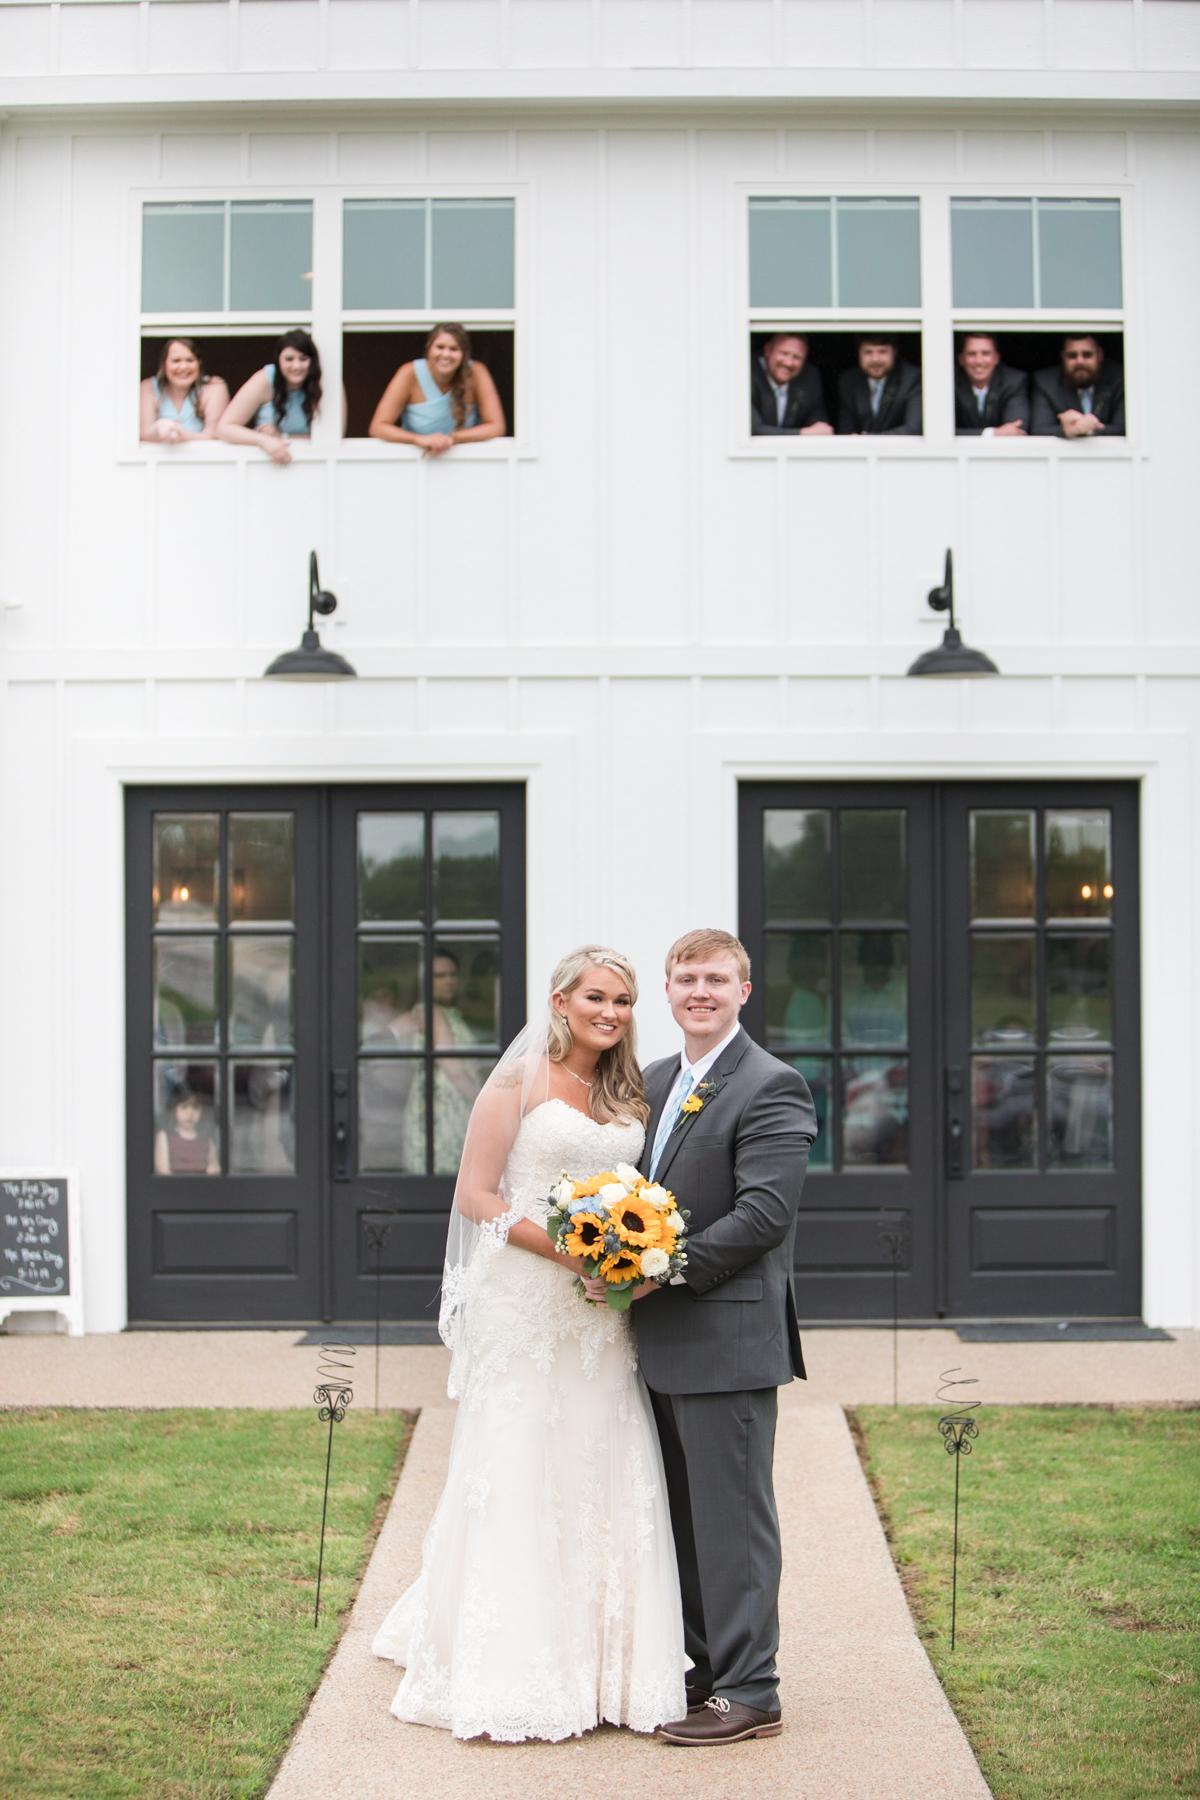 The-venue-at-white-oak-farms-wedding-nashville-wedding-photographers-0179.jpg